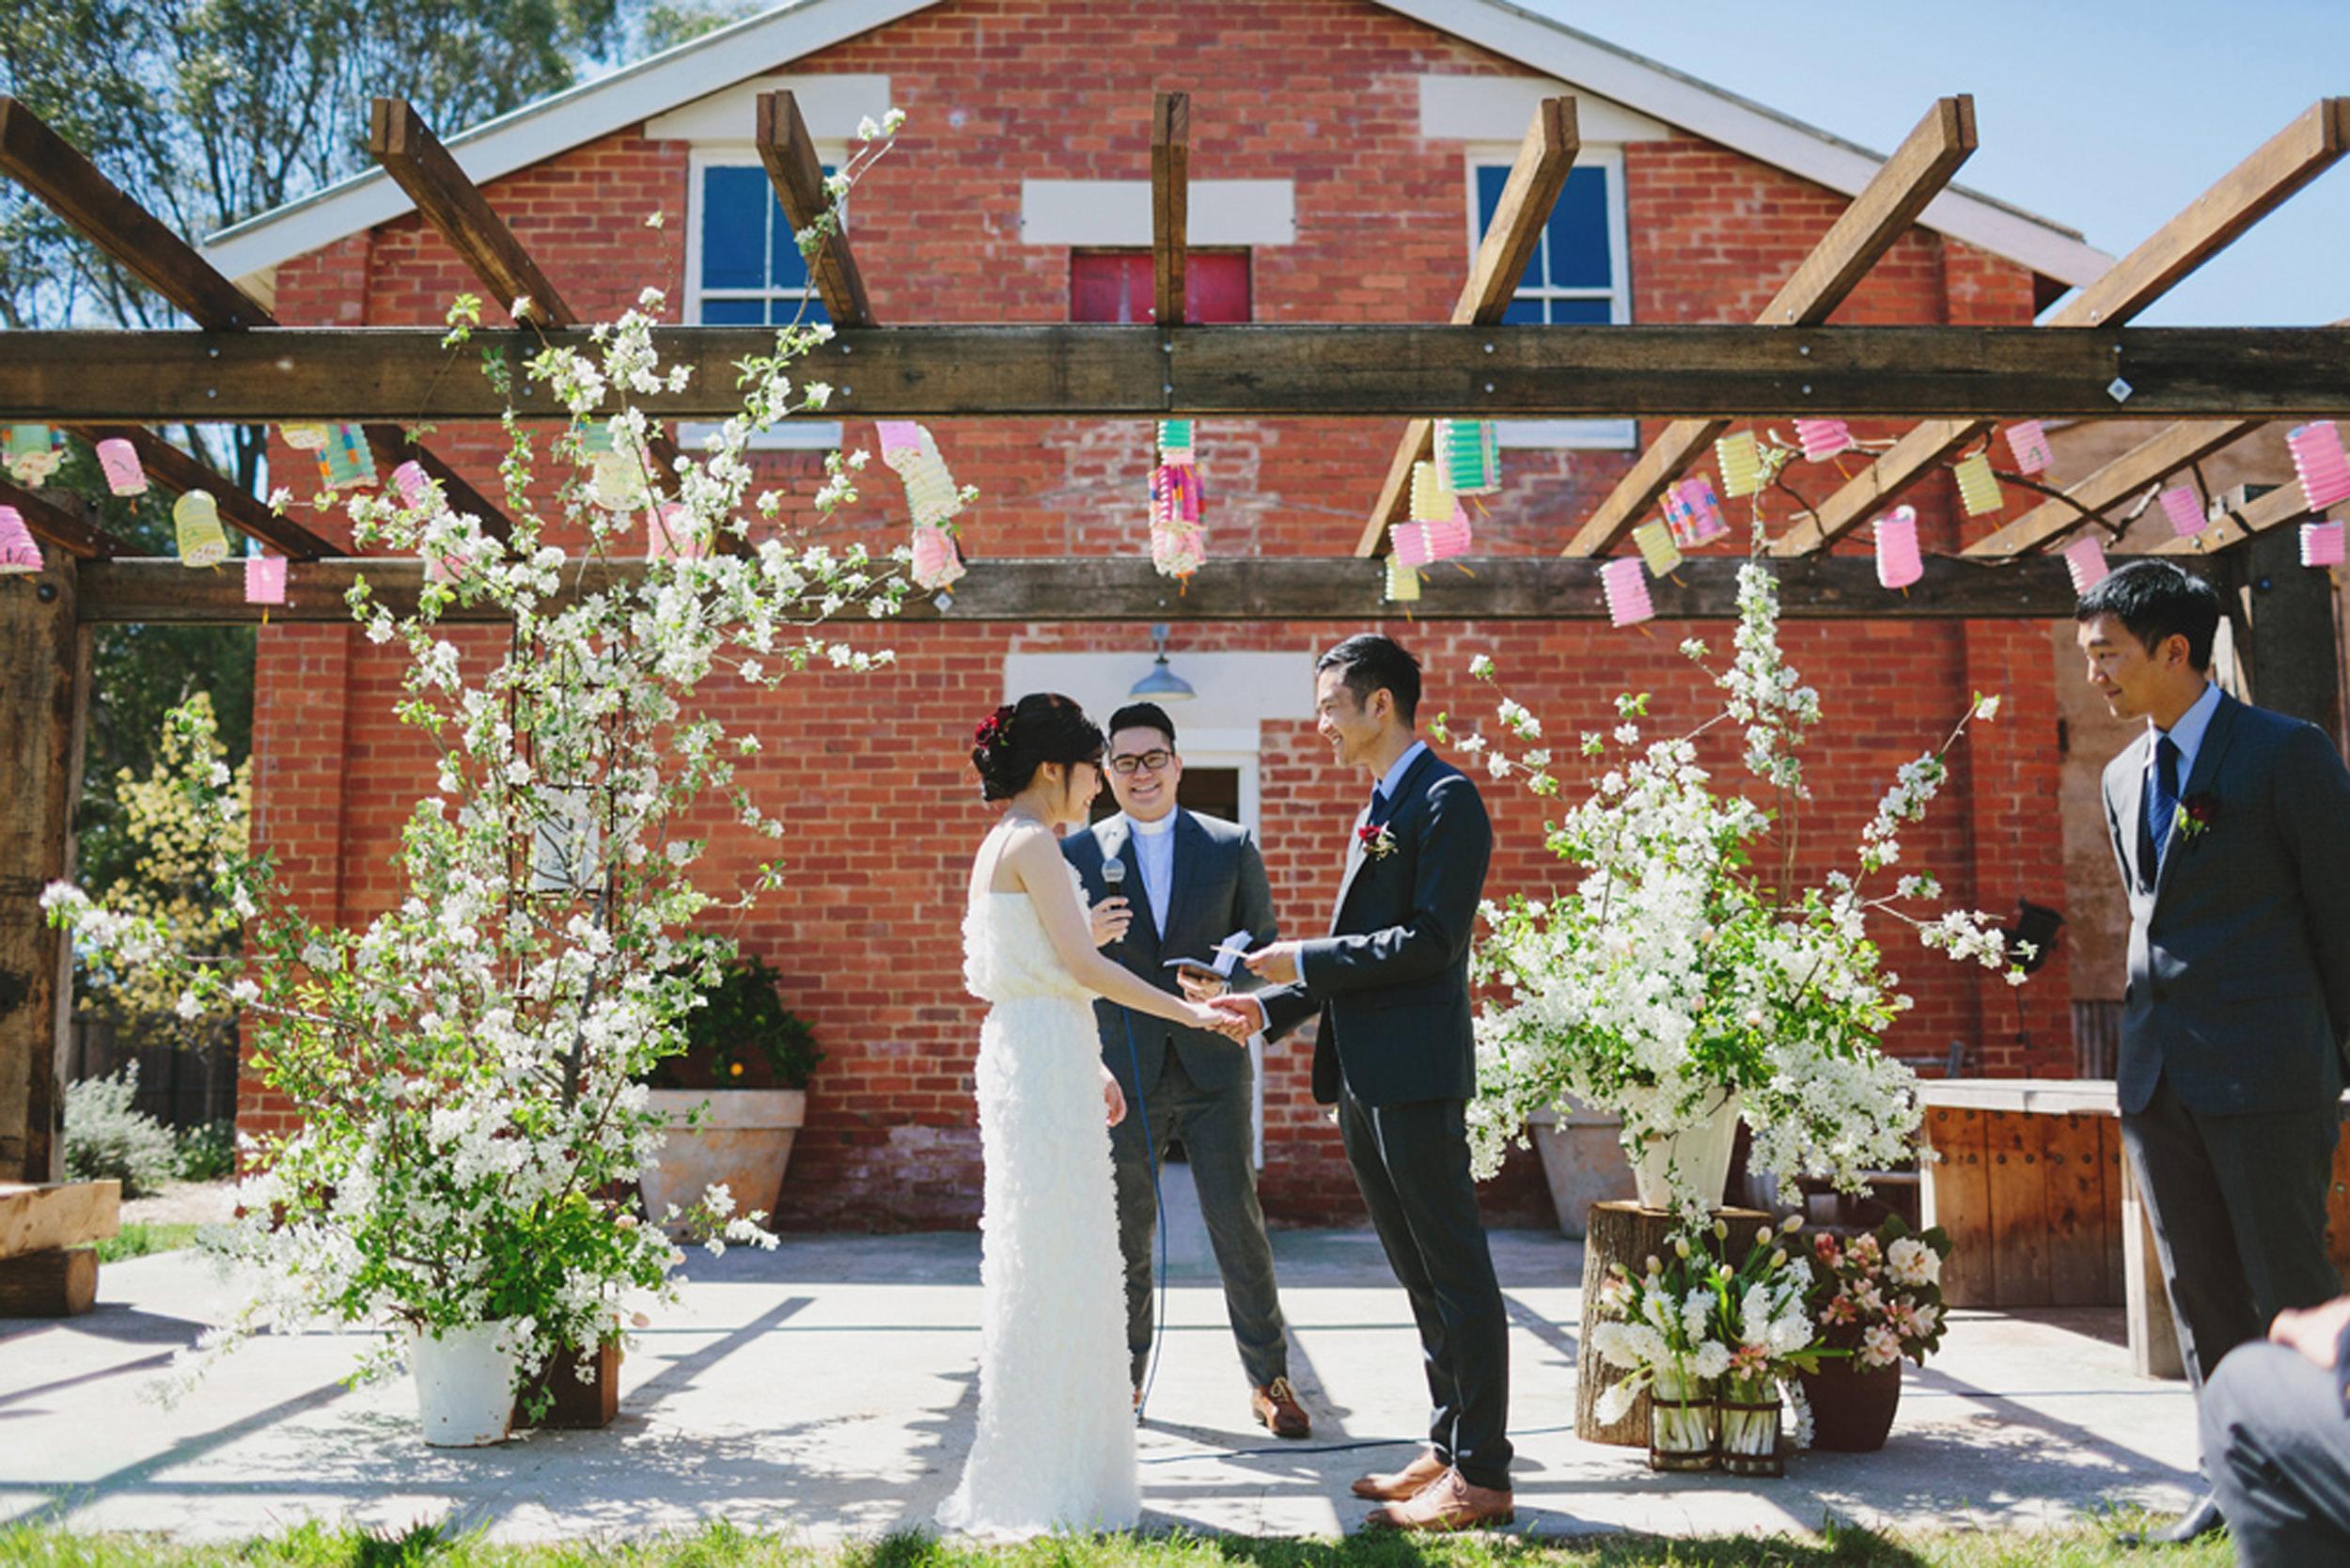 Butterland_Wedding_Anthony_Rachel25.JPG